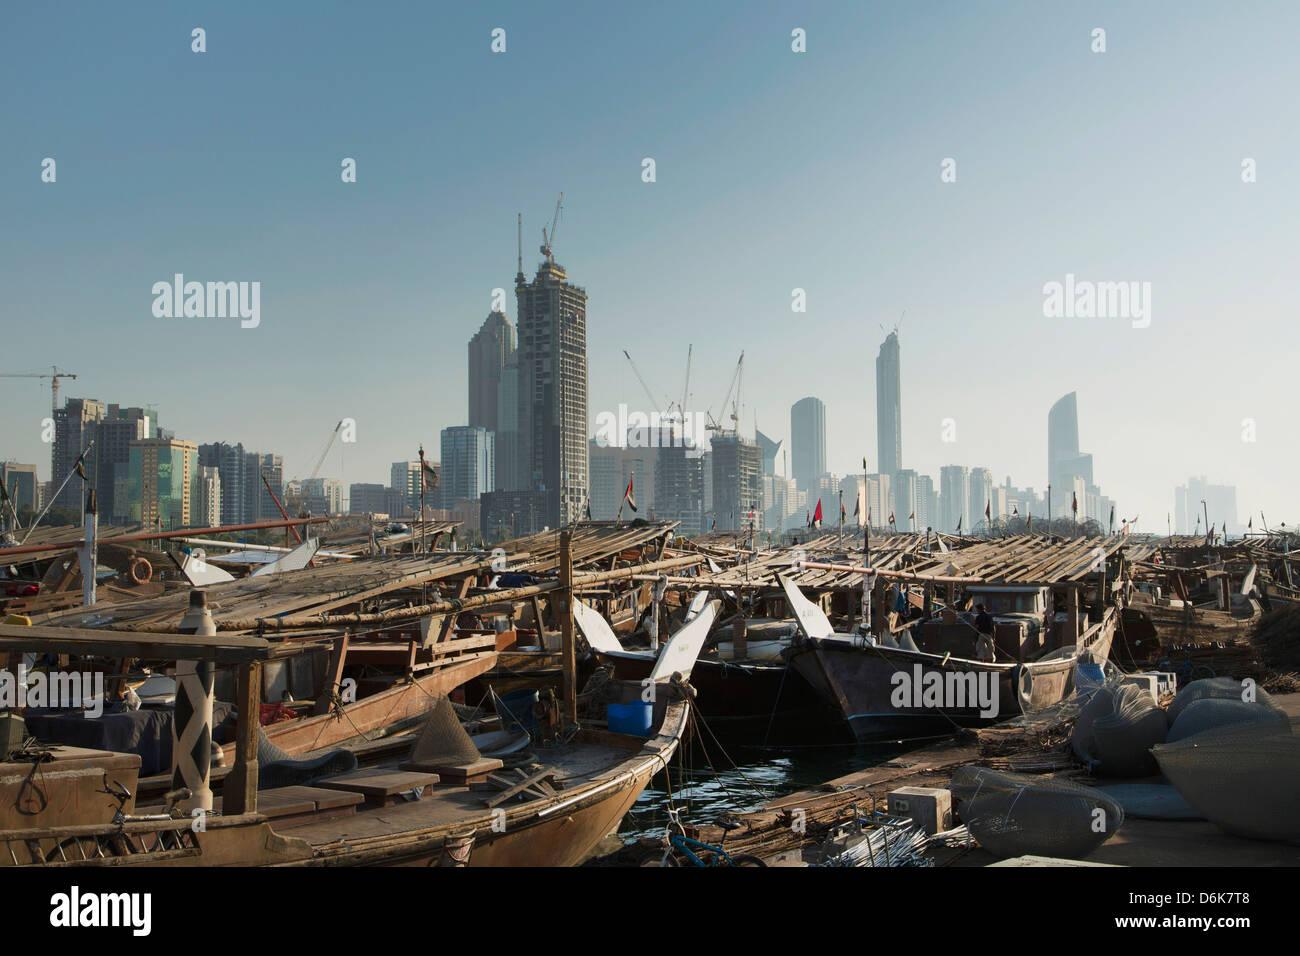 Abu Dhabi, Emirati Arabi Uniti, Medio Oriente Immagini Stock